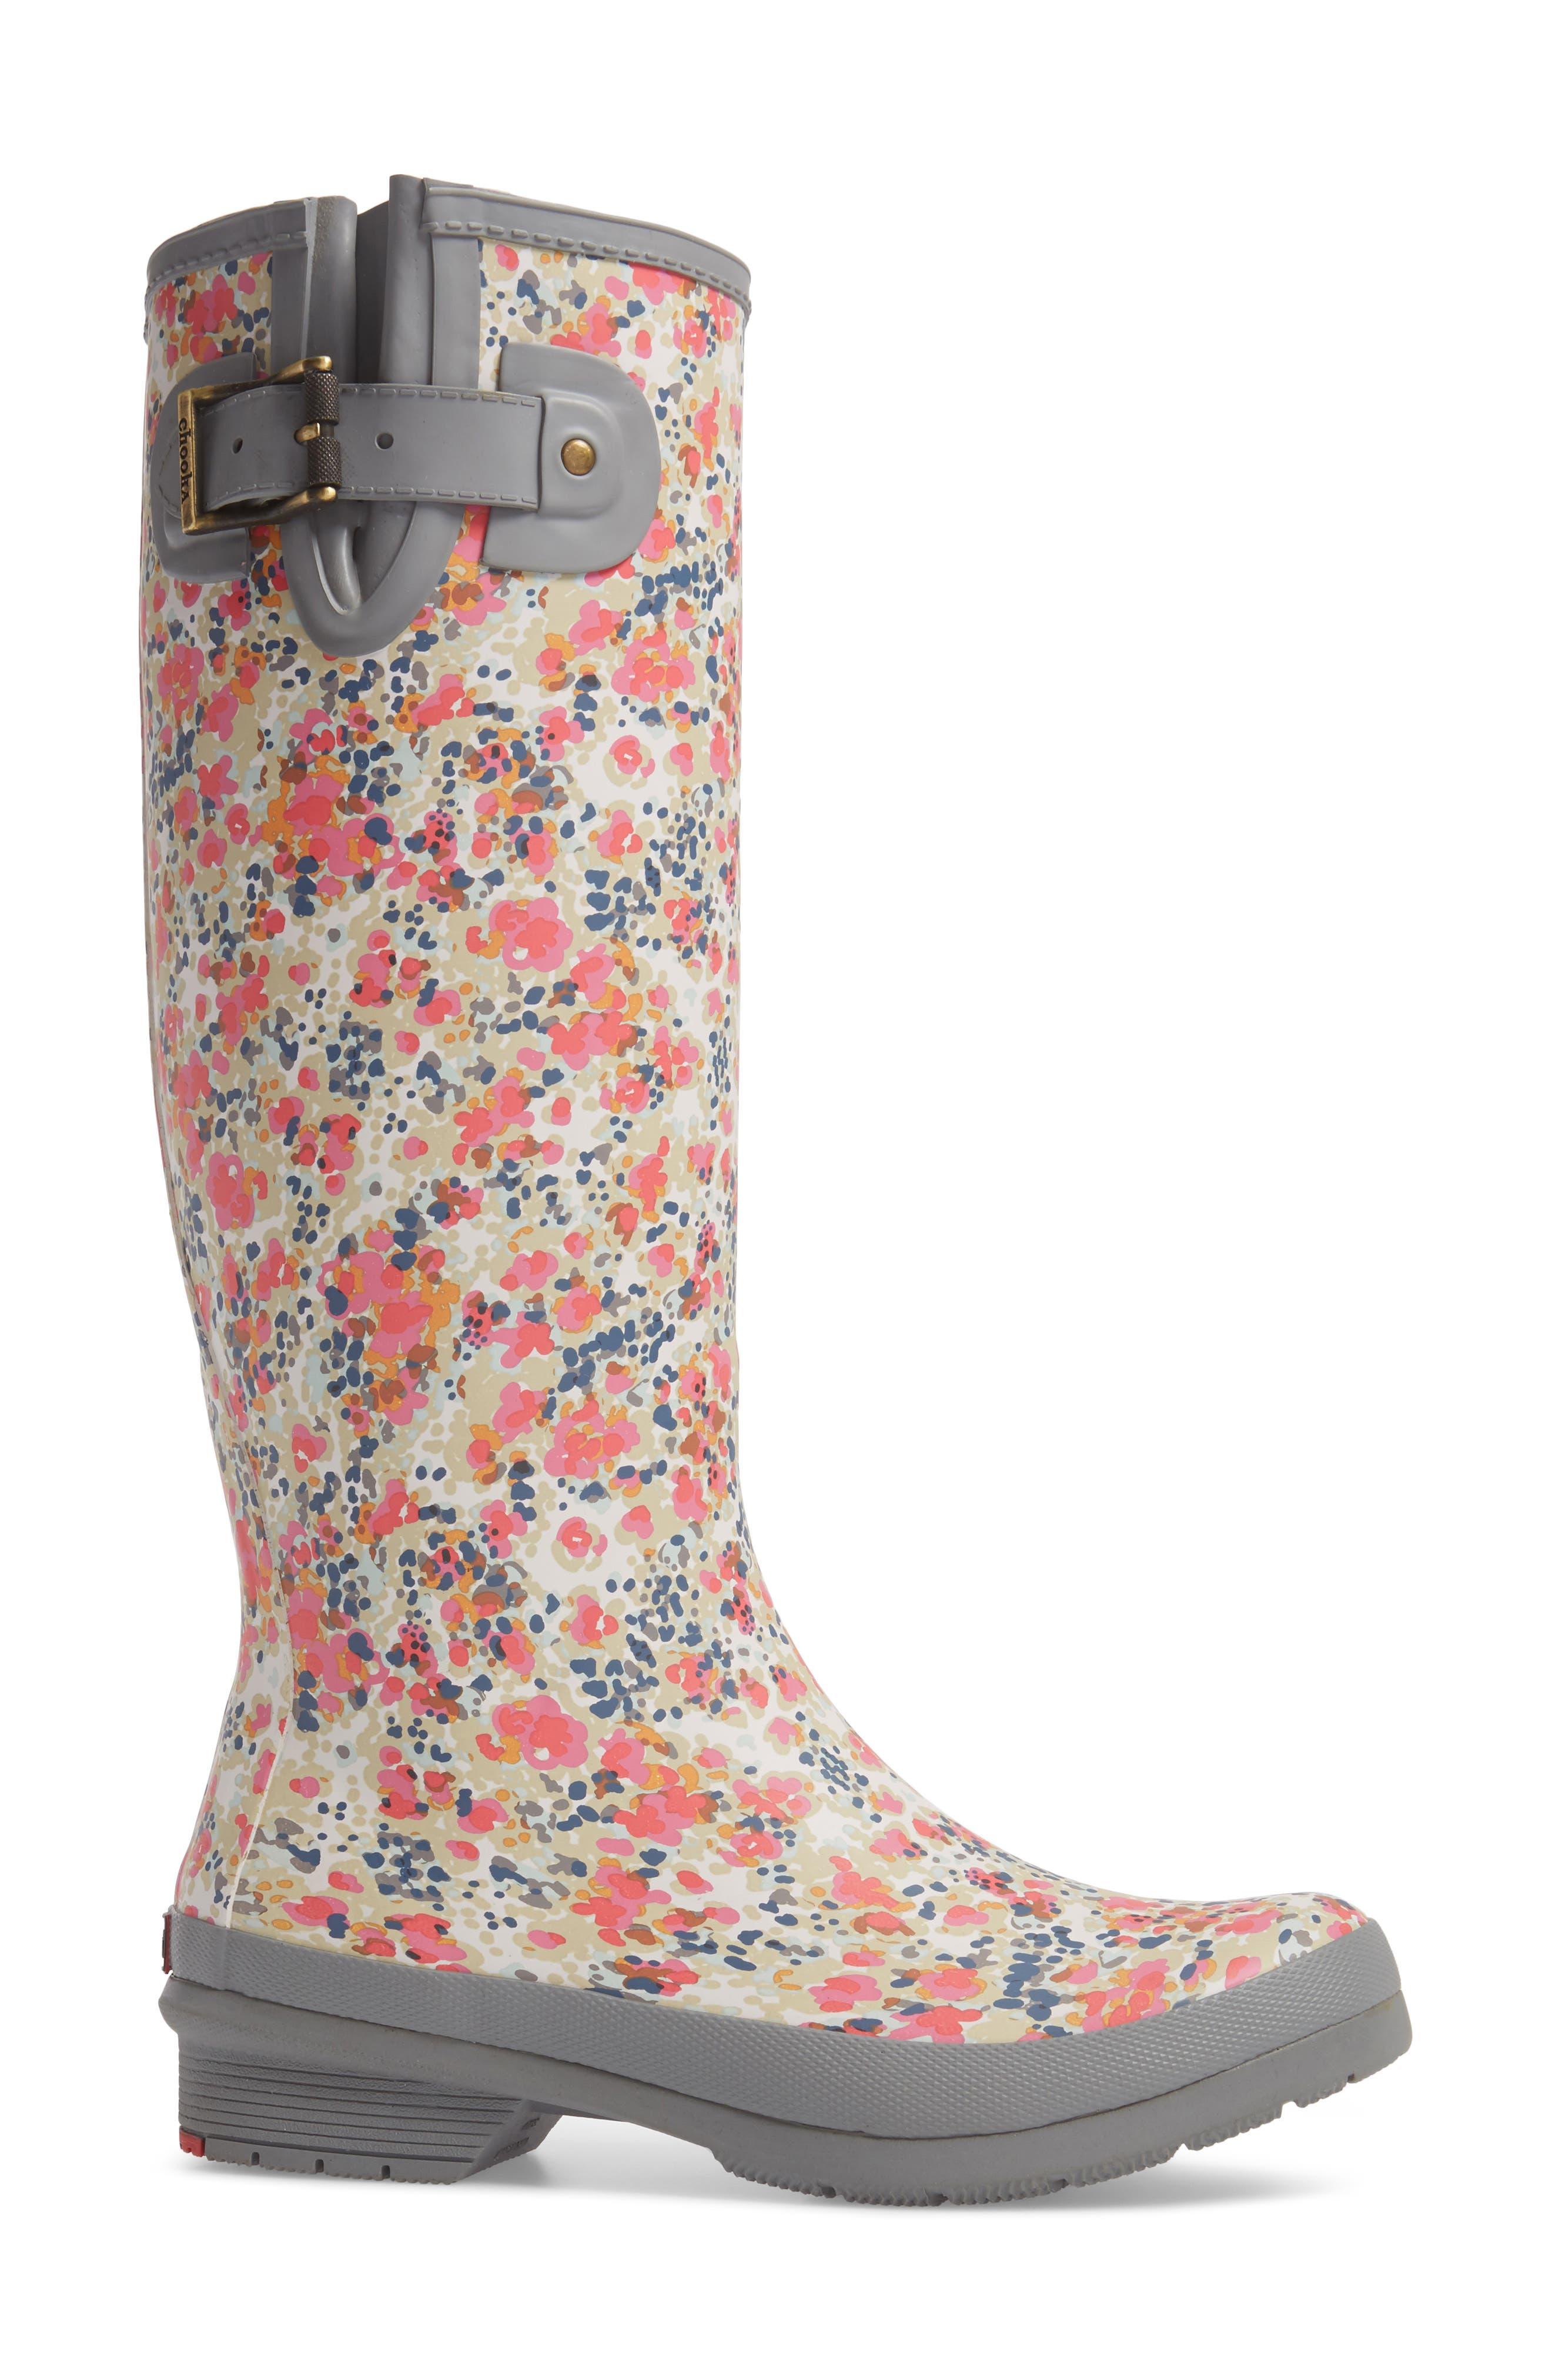 CHOOKA, Julia Floral Waterproof Rain Boot, Alternate thumbnail 3, color, GRAY